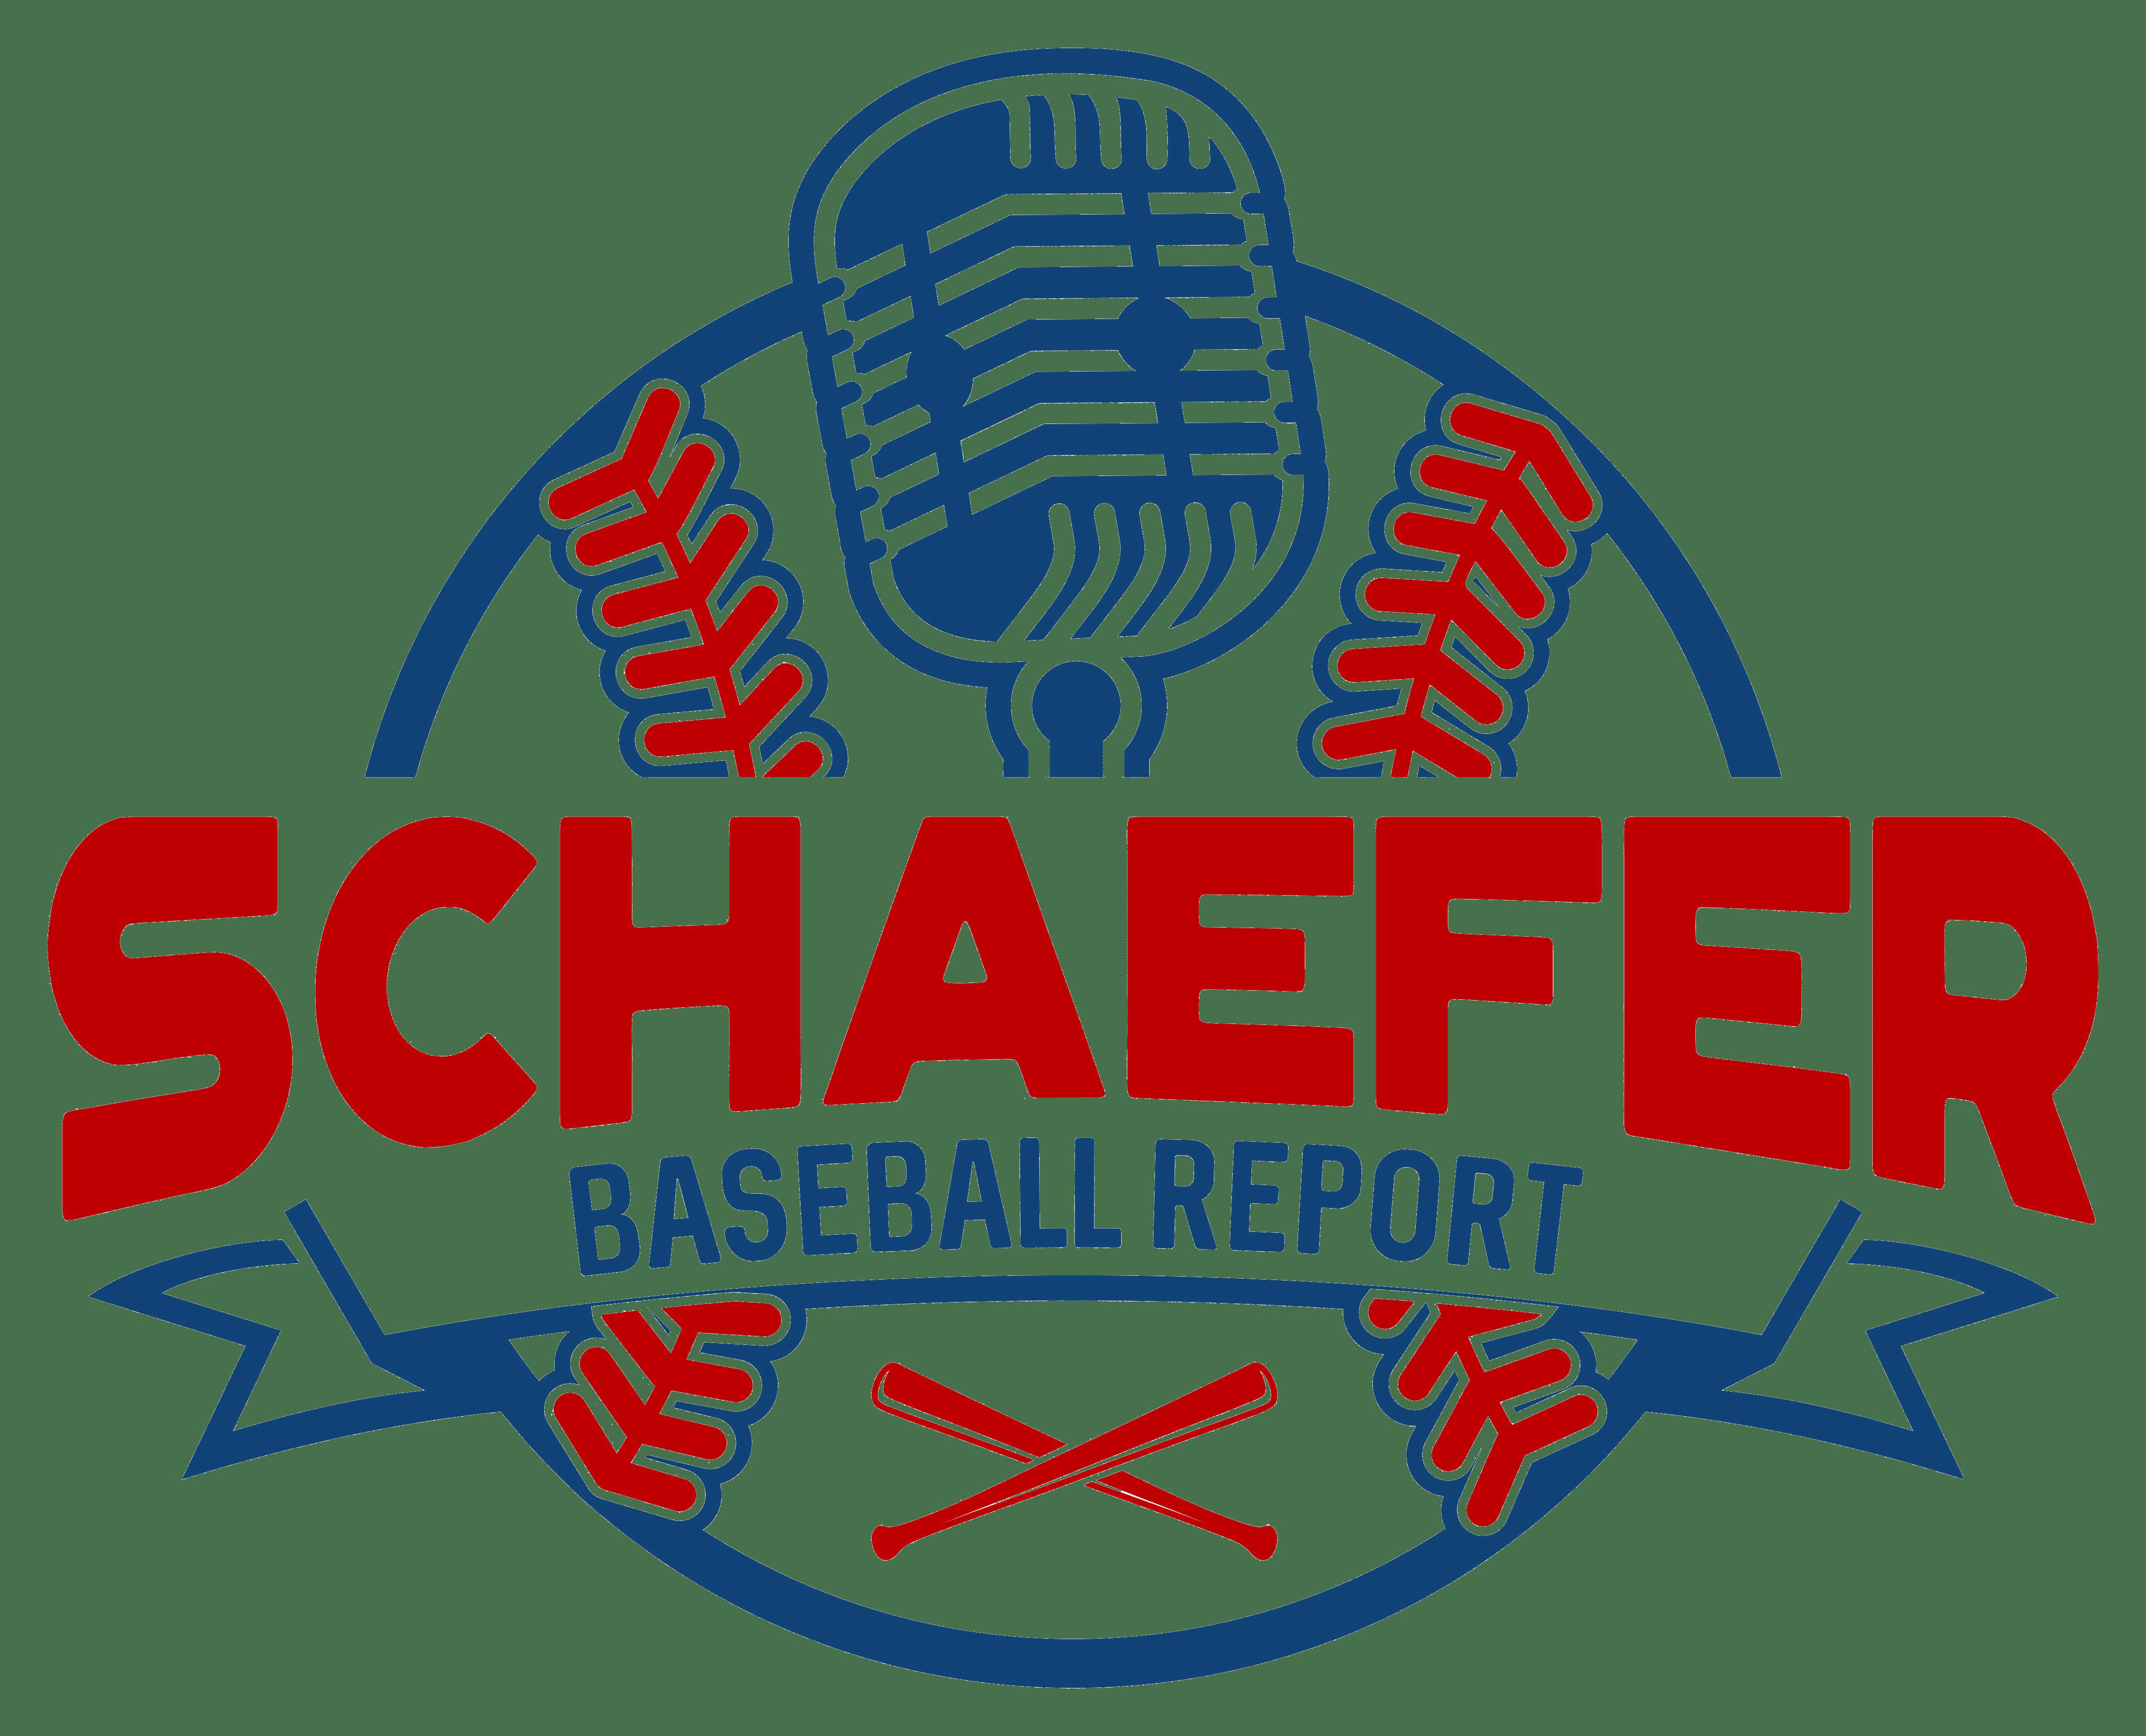 https://udacf.org/wp-content/uploads/2019/10/Schaefer-Baseball-Report-Logo-transparent.png